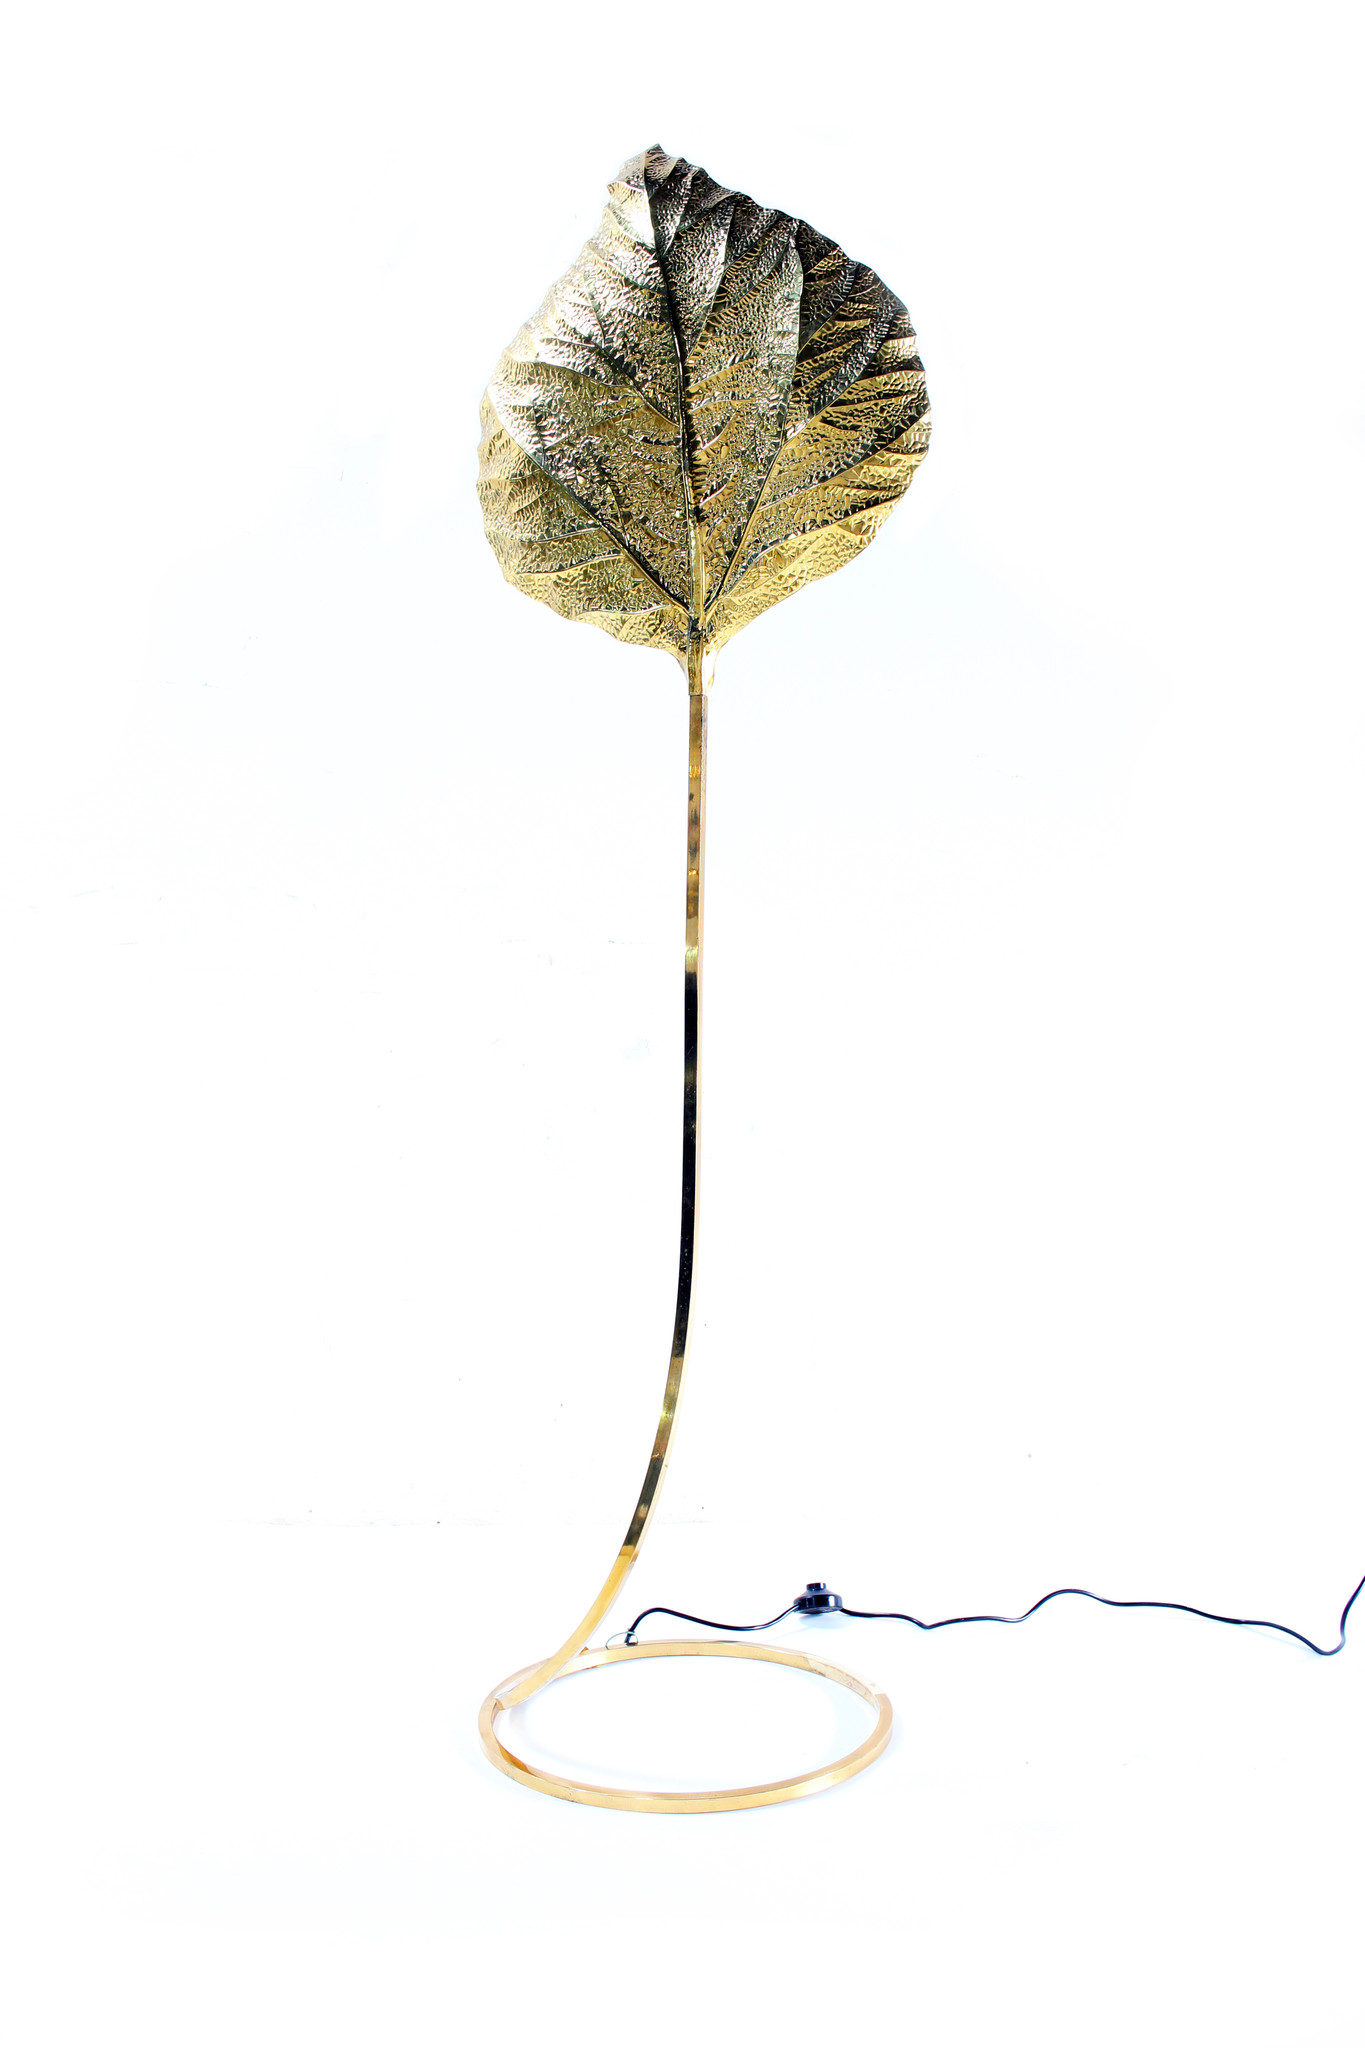 Authentieke Tommaso Barbi vloerlamp 1970